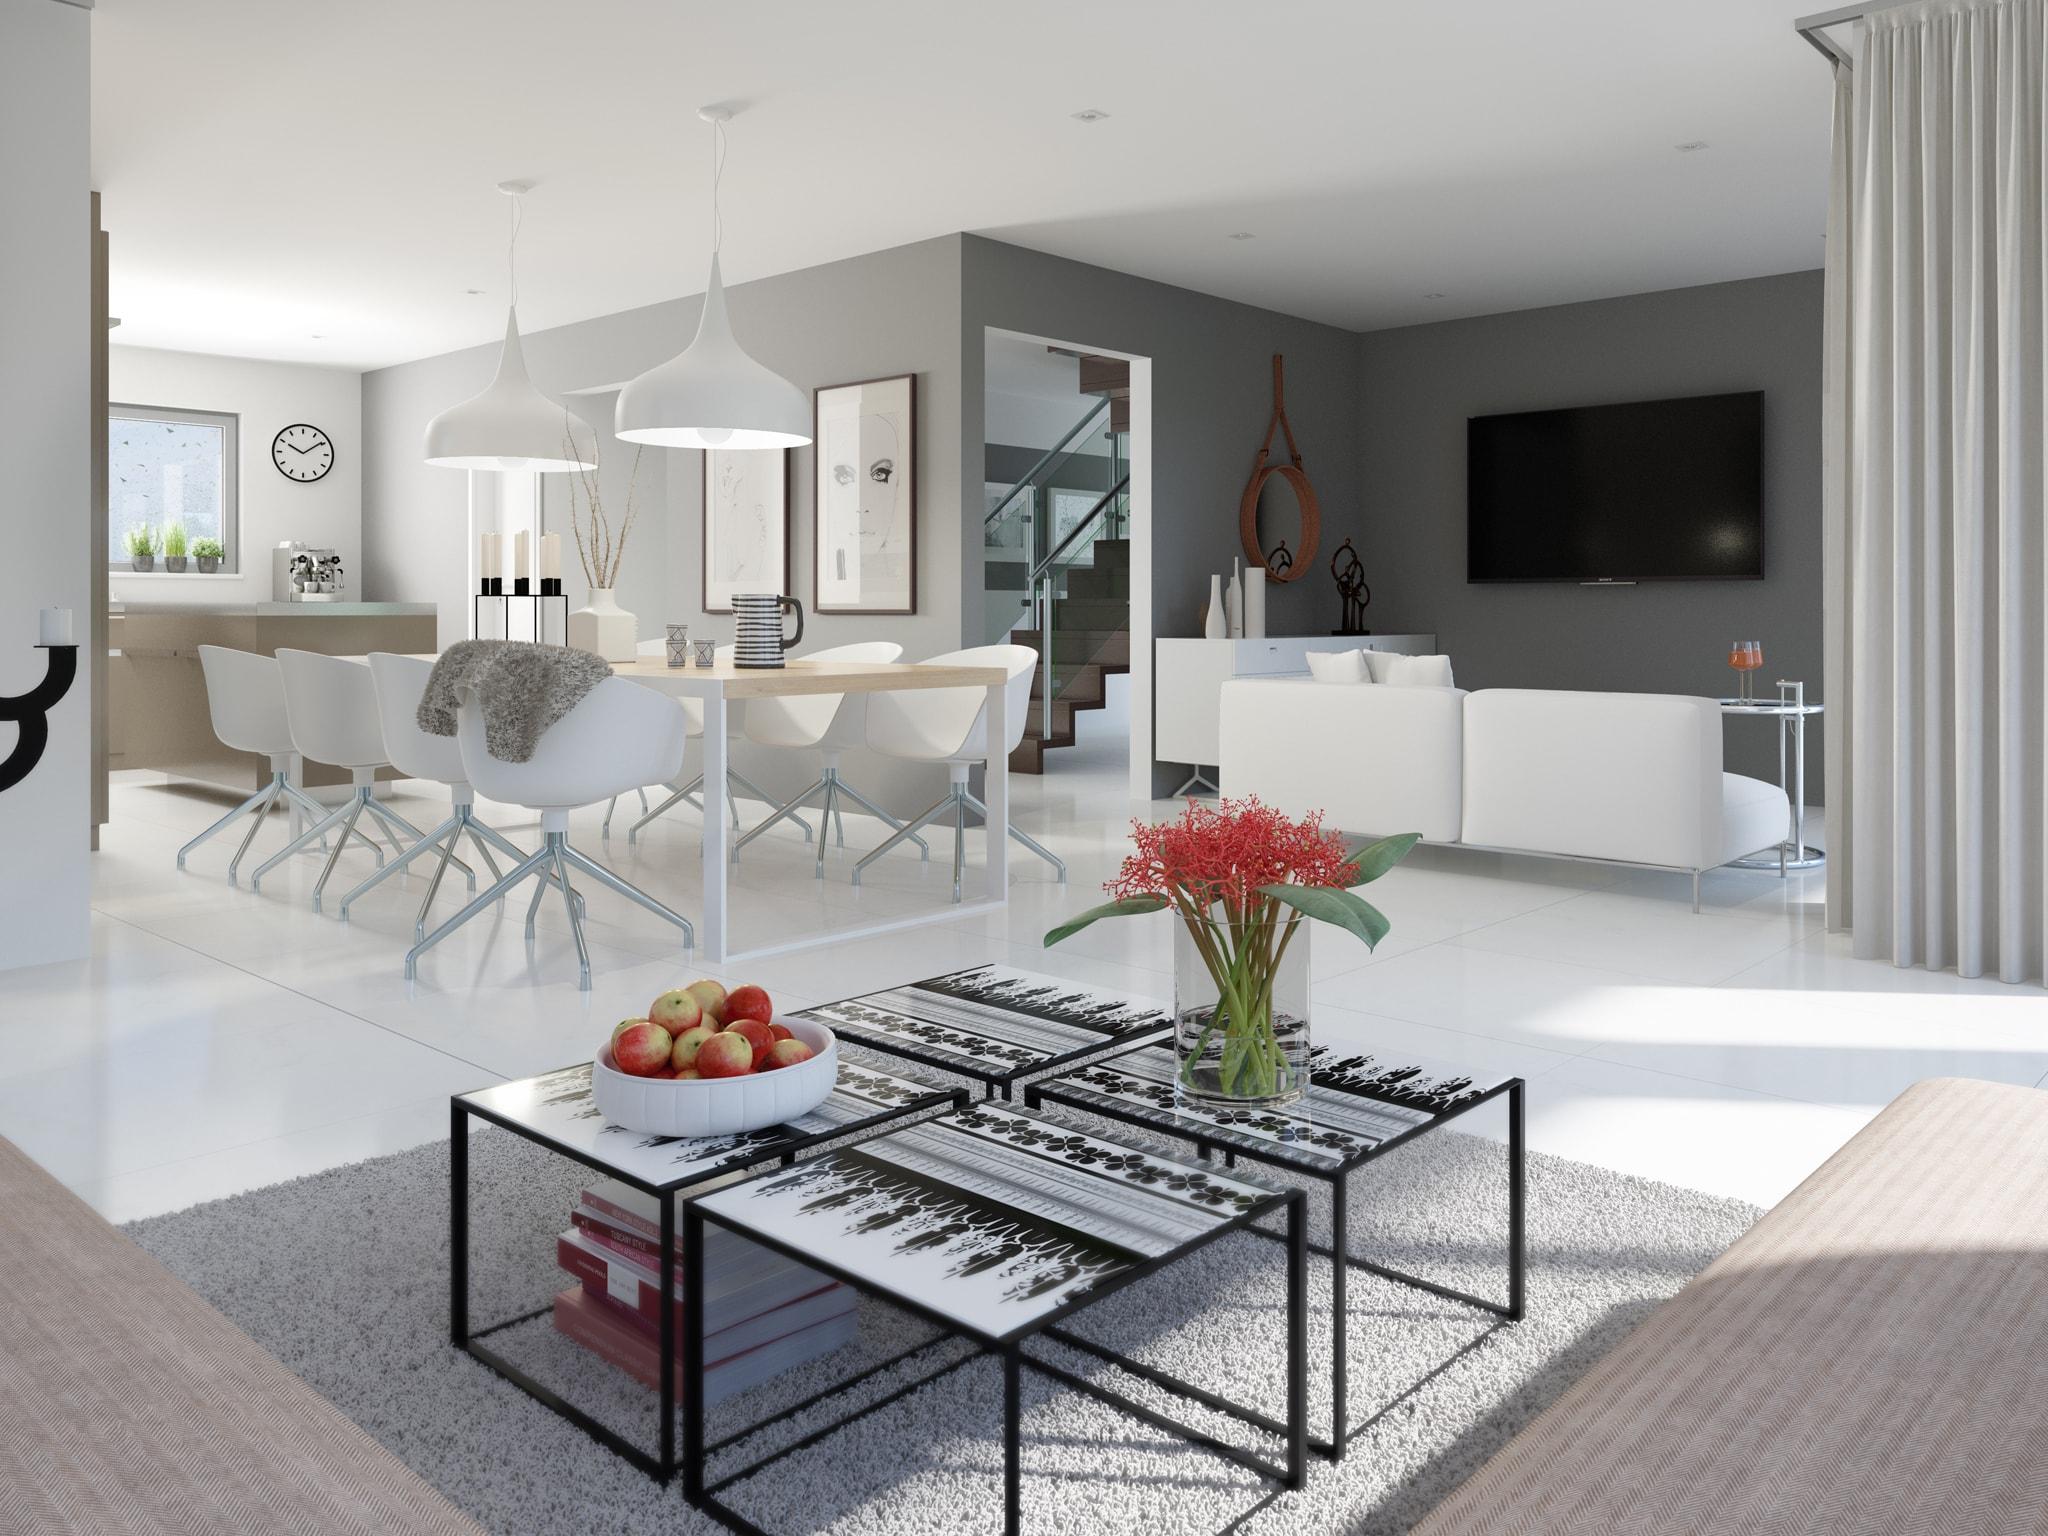 Wohn-Esszimmer Ideen Inneneinrichtung modern in weiß & grau - Wohnideen Einfamilienhaus Bien Zenker Fertighaus FANTASTIC 161 V5 - HausbauDirekt.de